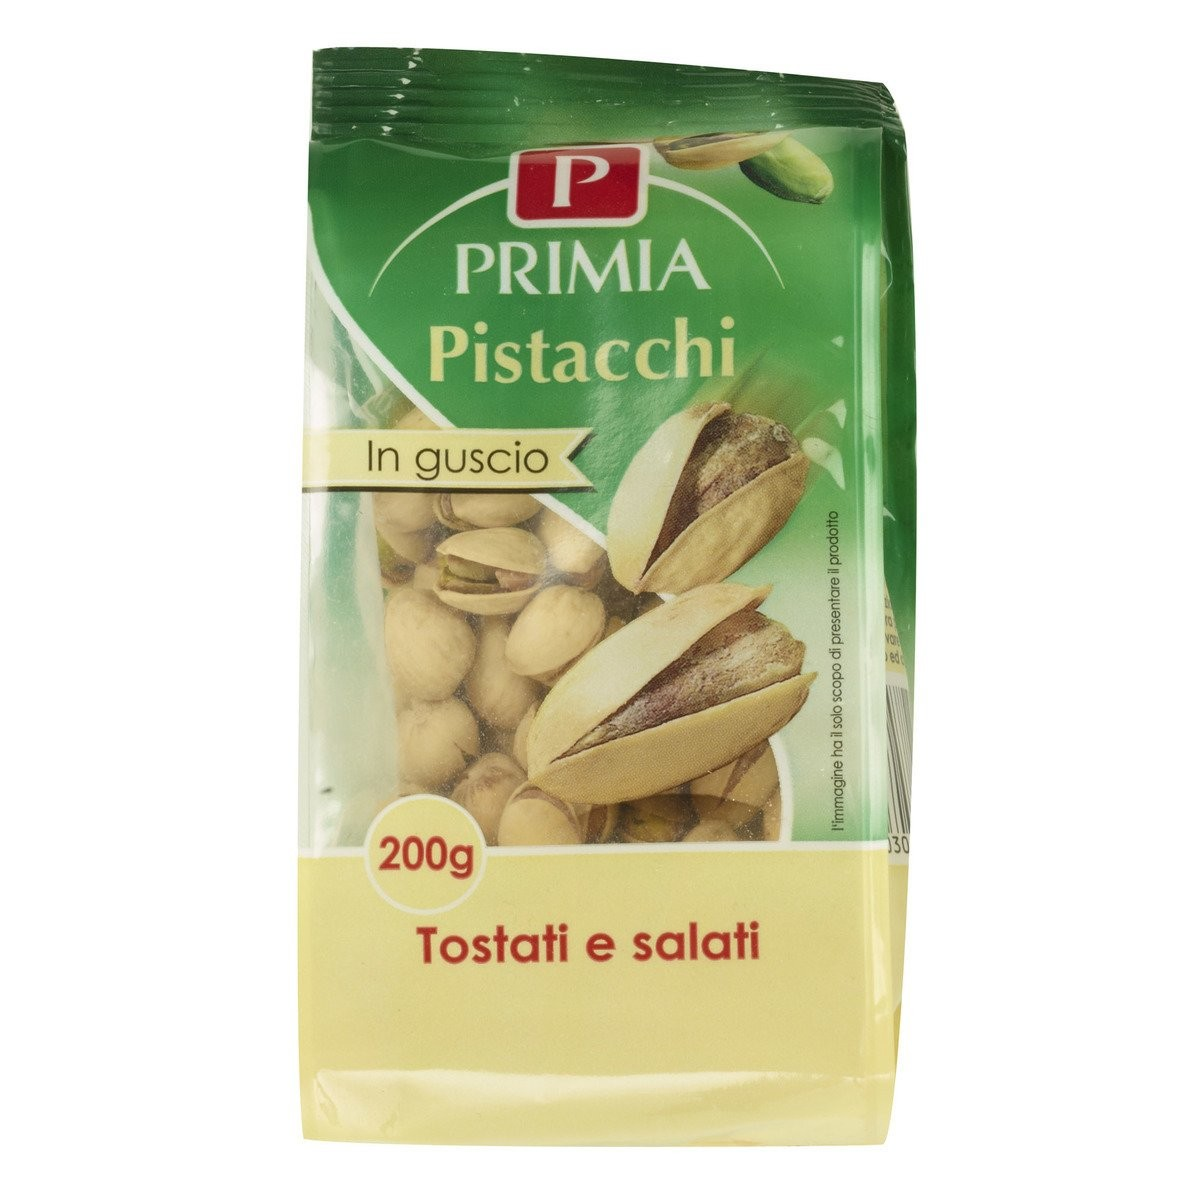 Primia Pistacchi tostati e salati